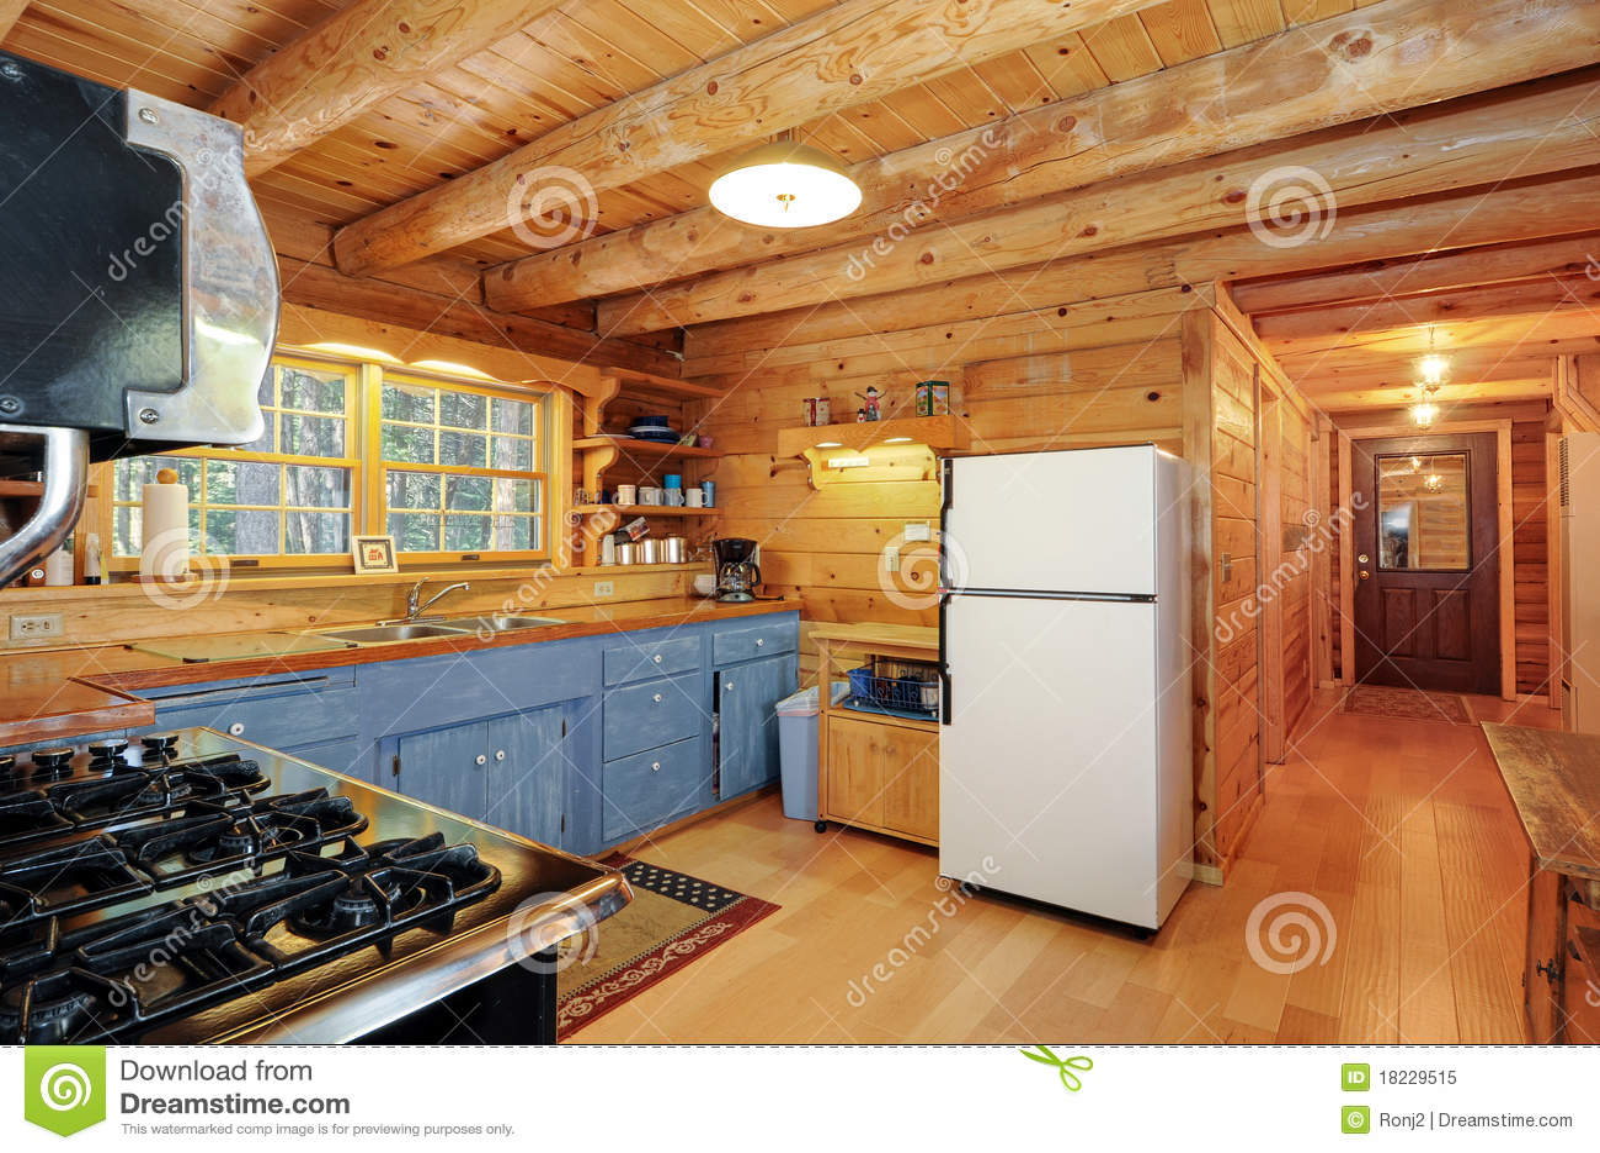 Log cabin on a lake royalty free stock photography image 7866317 - Log House Kitchen Royalty Free Stock Photo